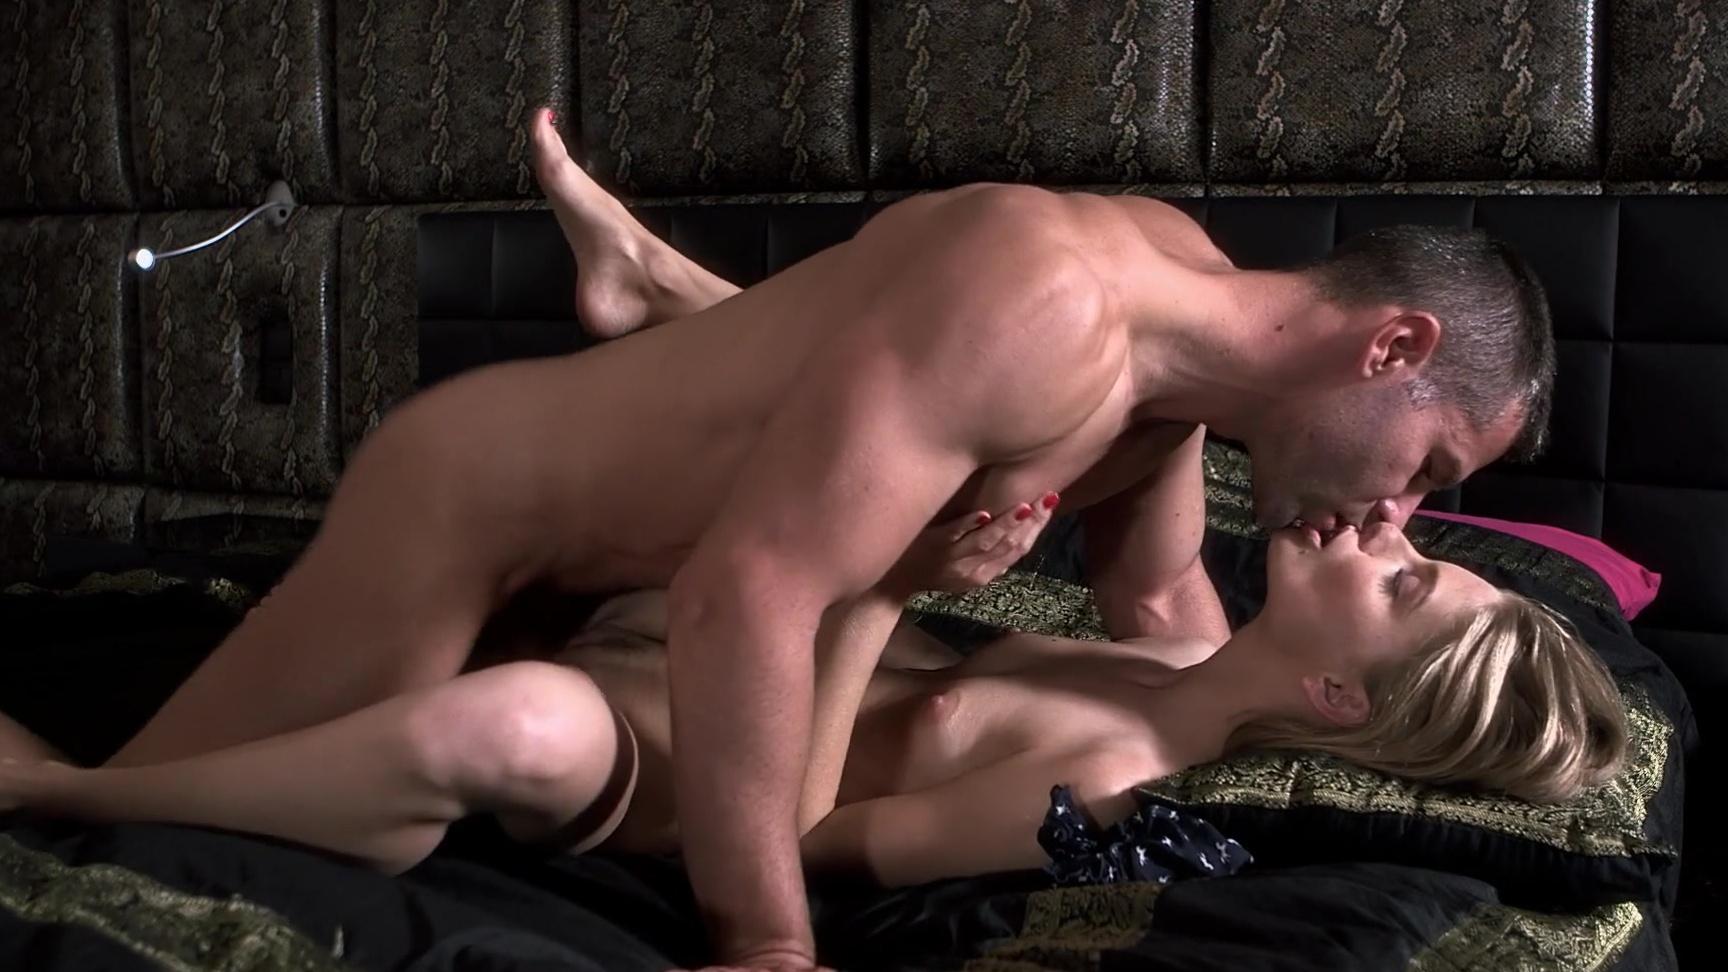 cayenne klein enjoys sensual oral foreplay steamy sex